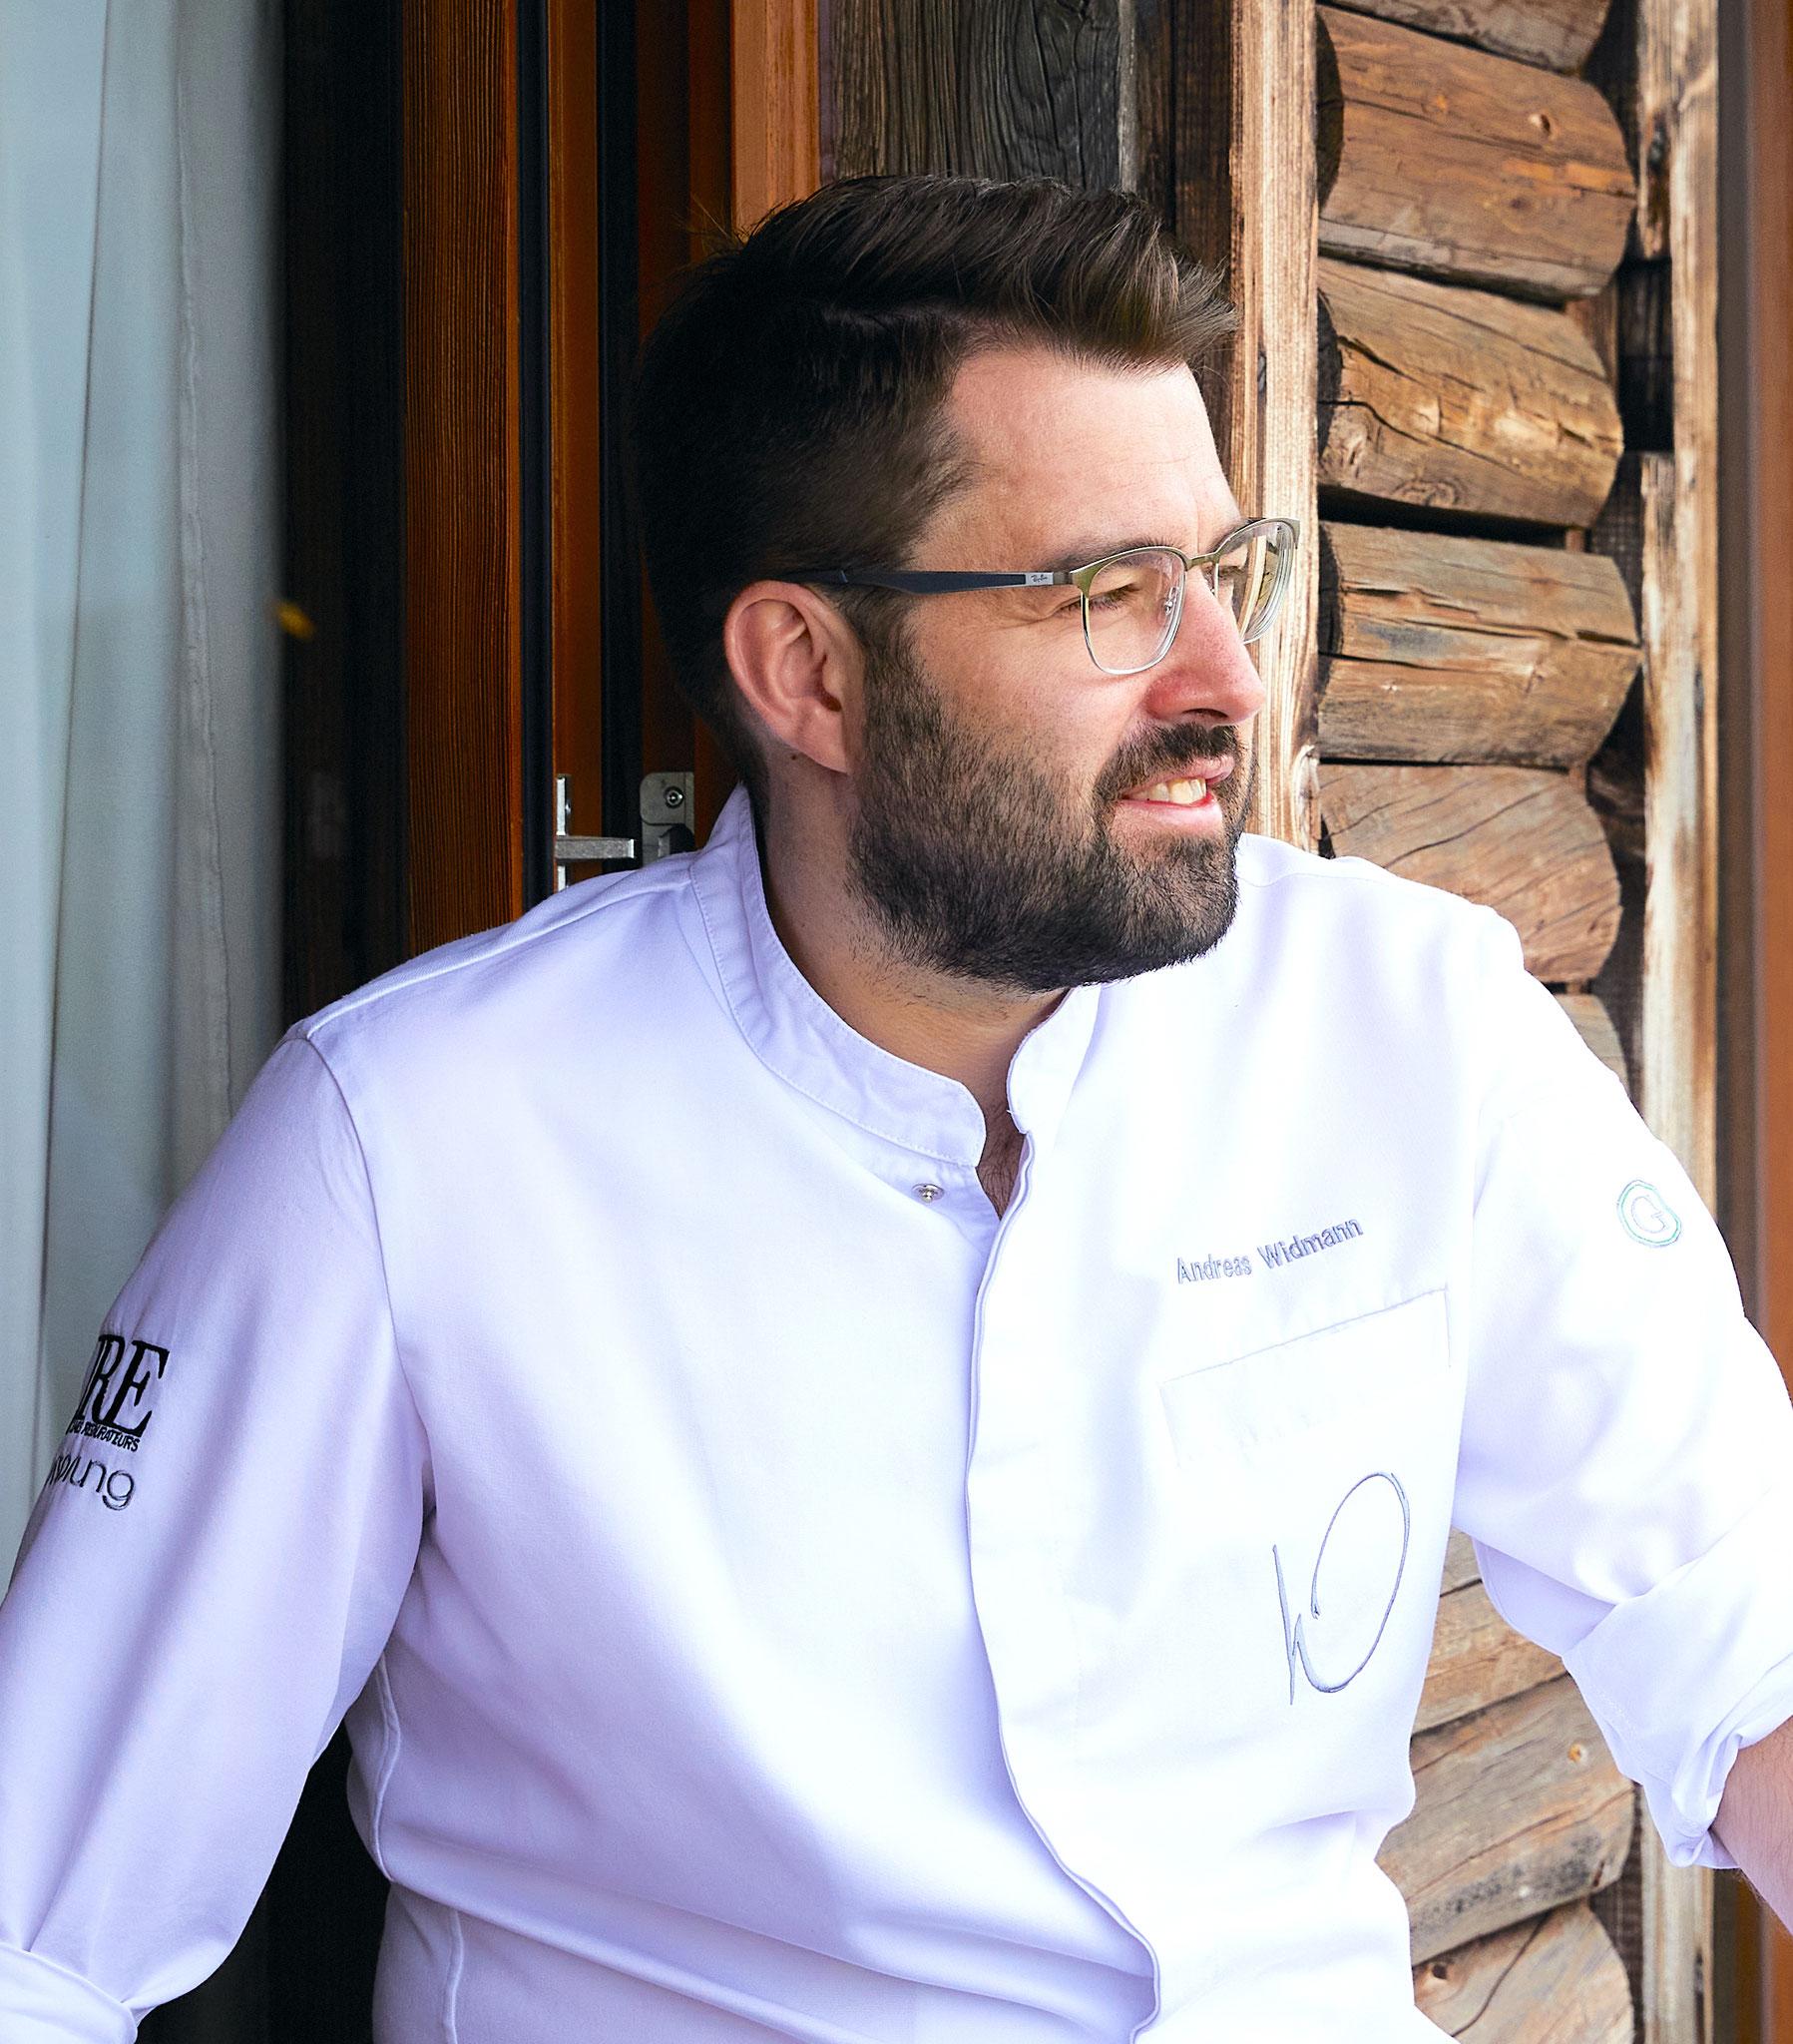 Chef Andi Widmann